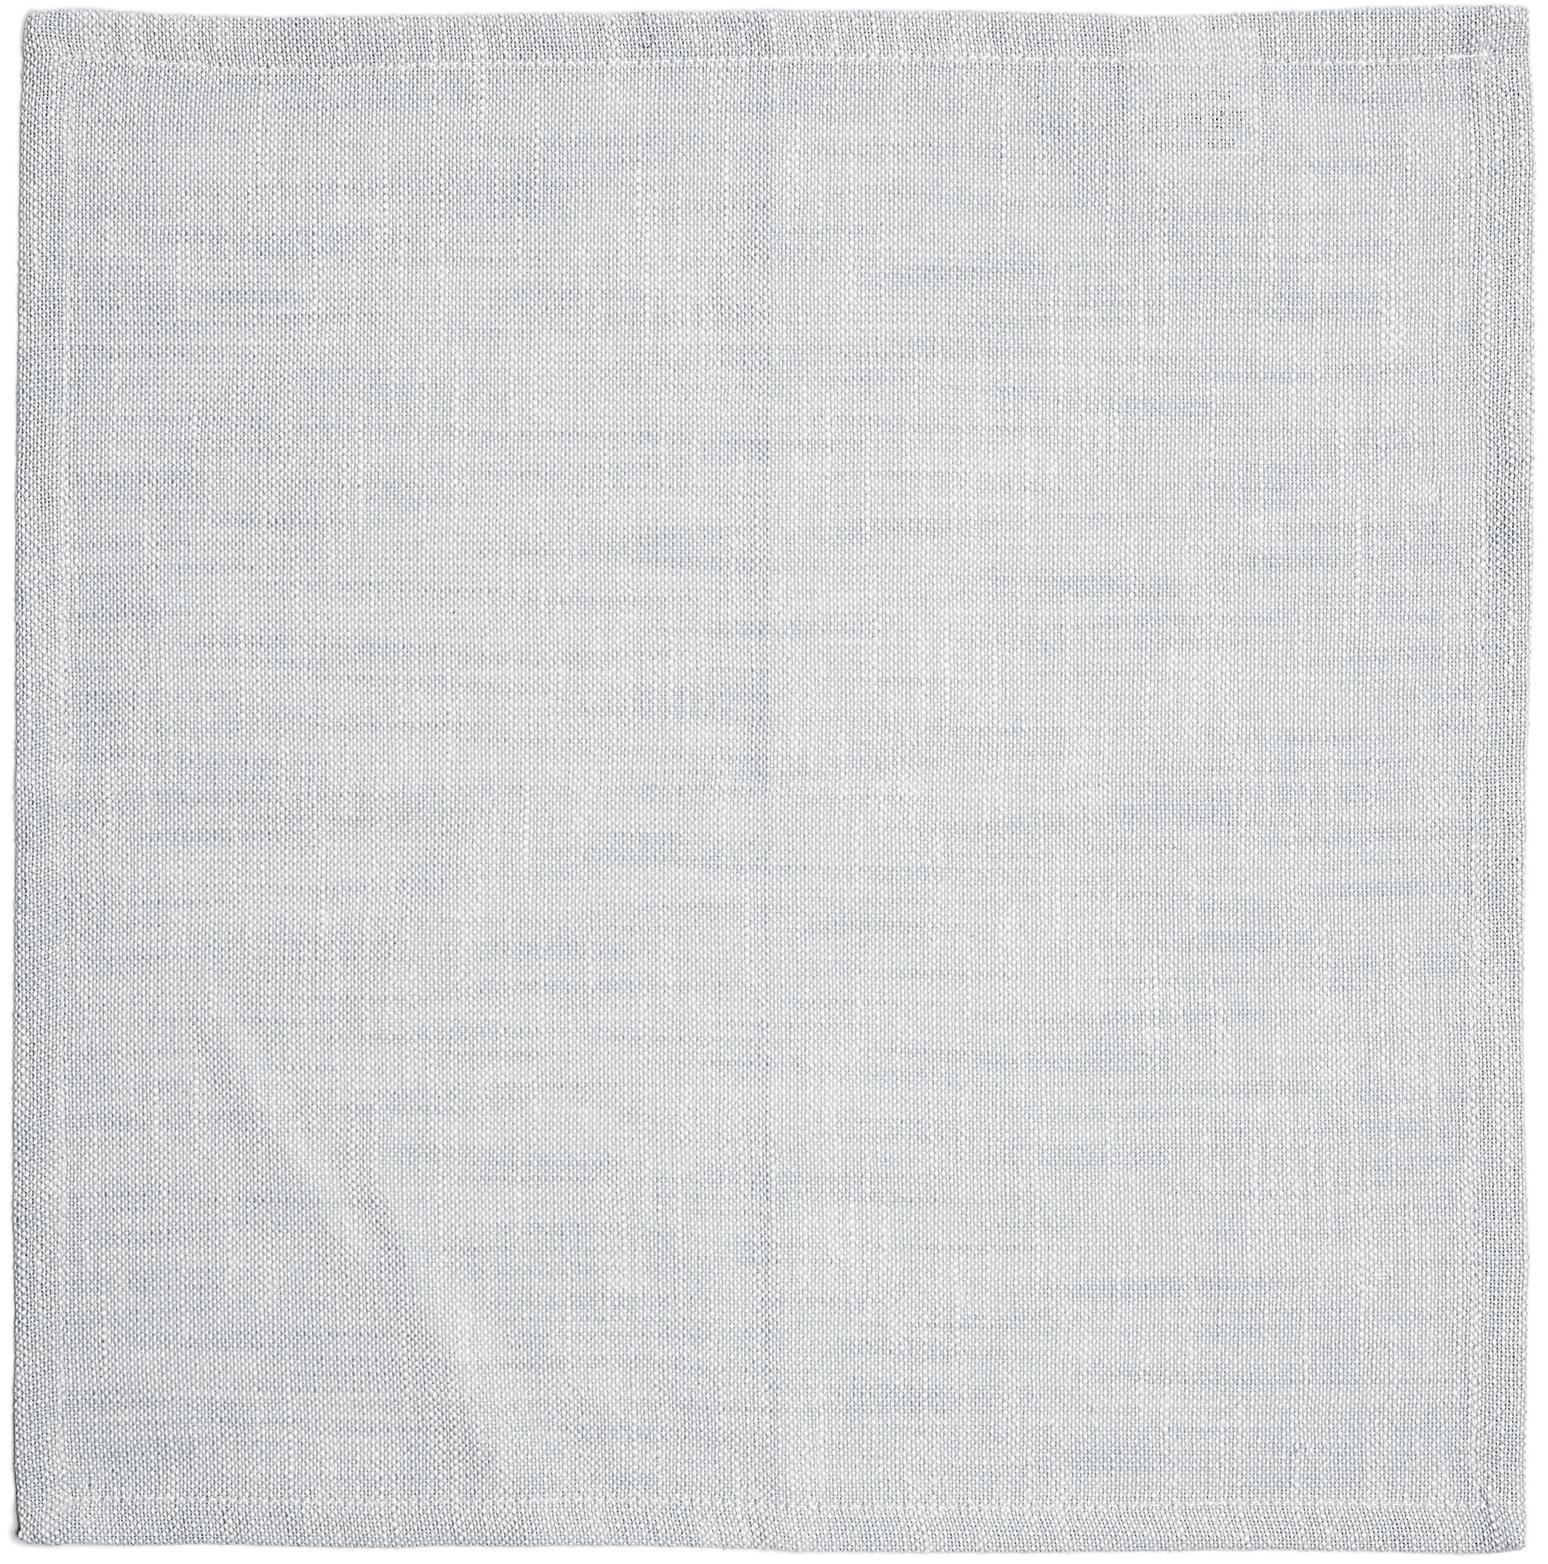 Servilletas de algodón Tonnika, 4uds., Algodón, Gris azulado, An 45 x L 45 cm